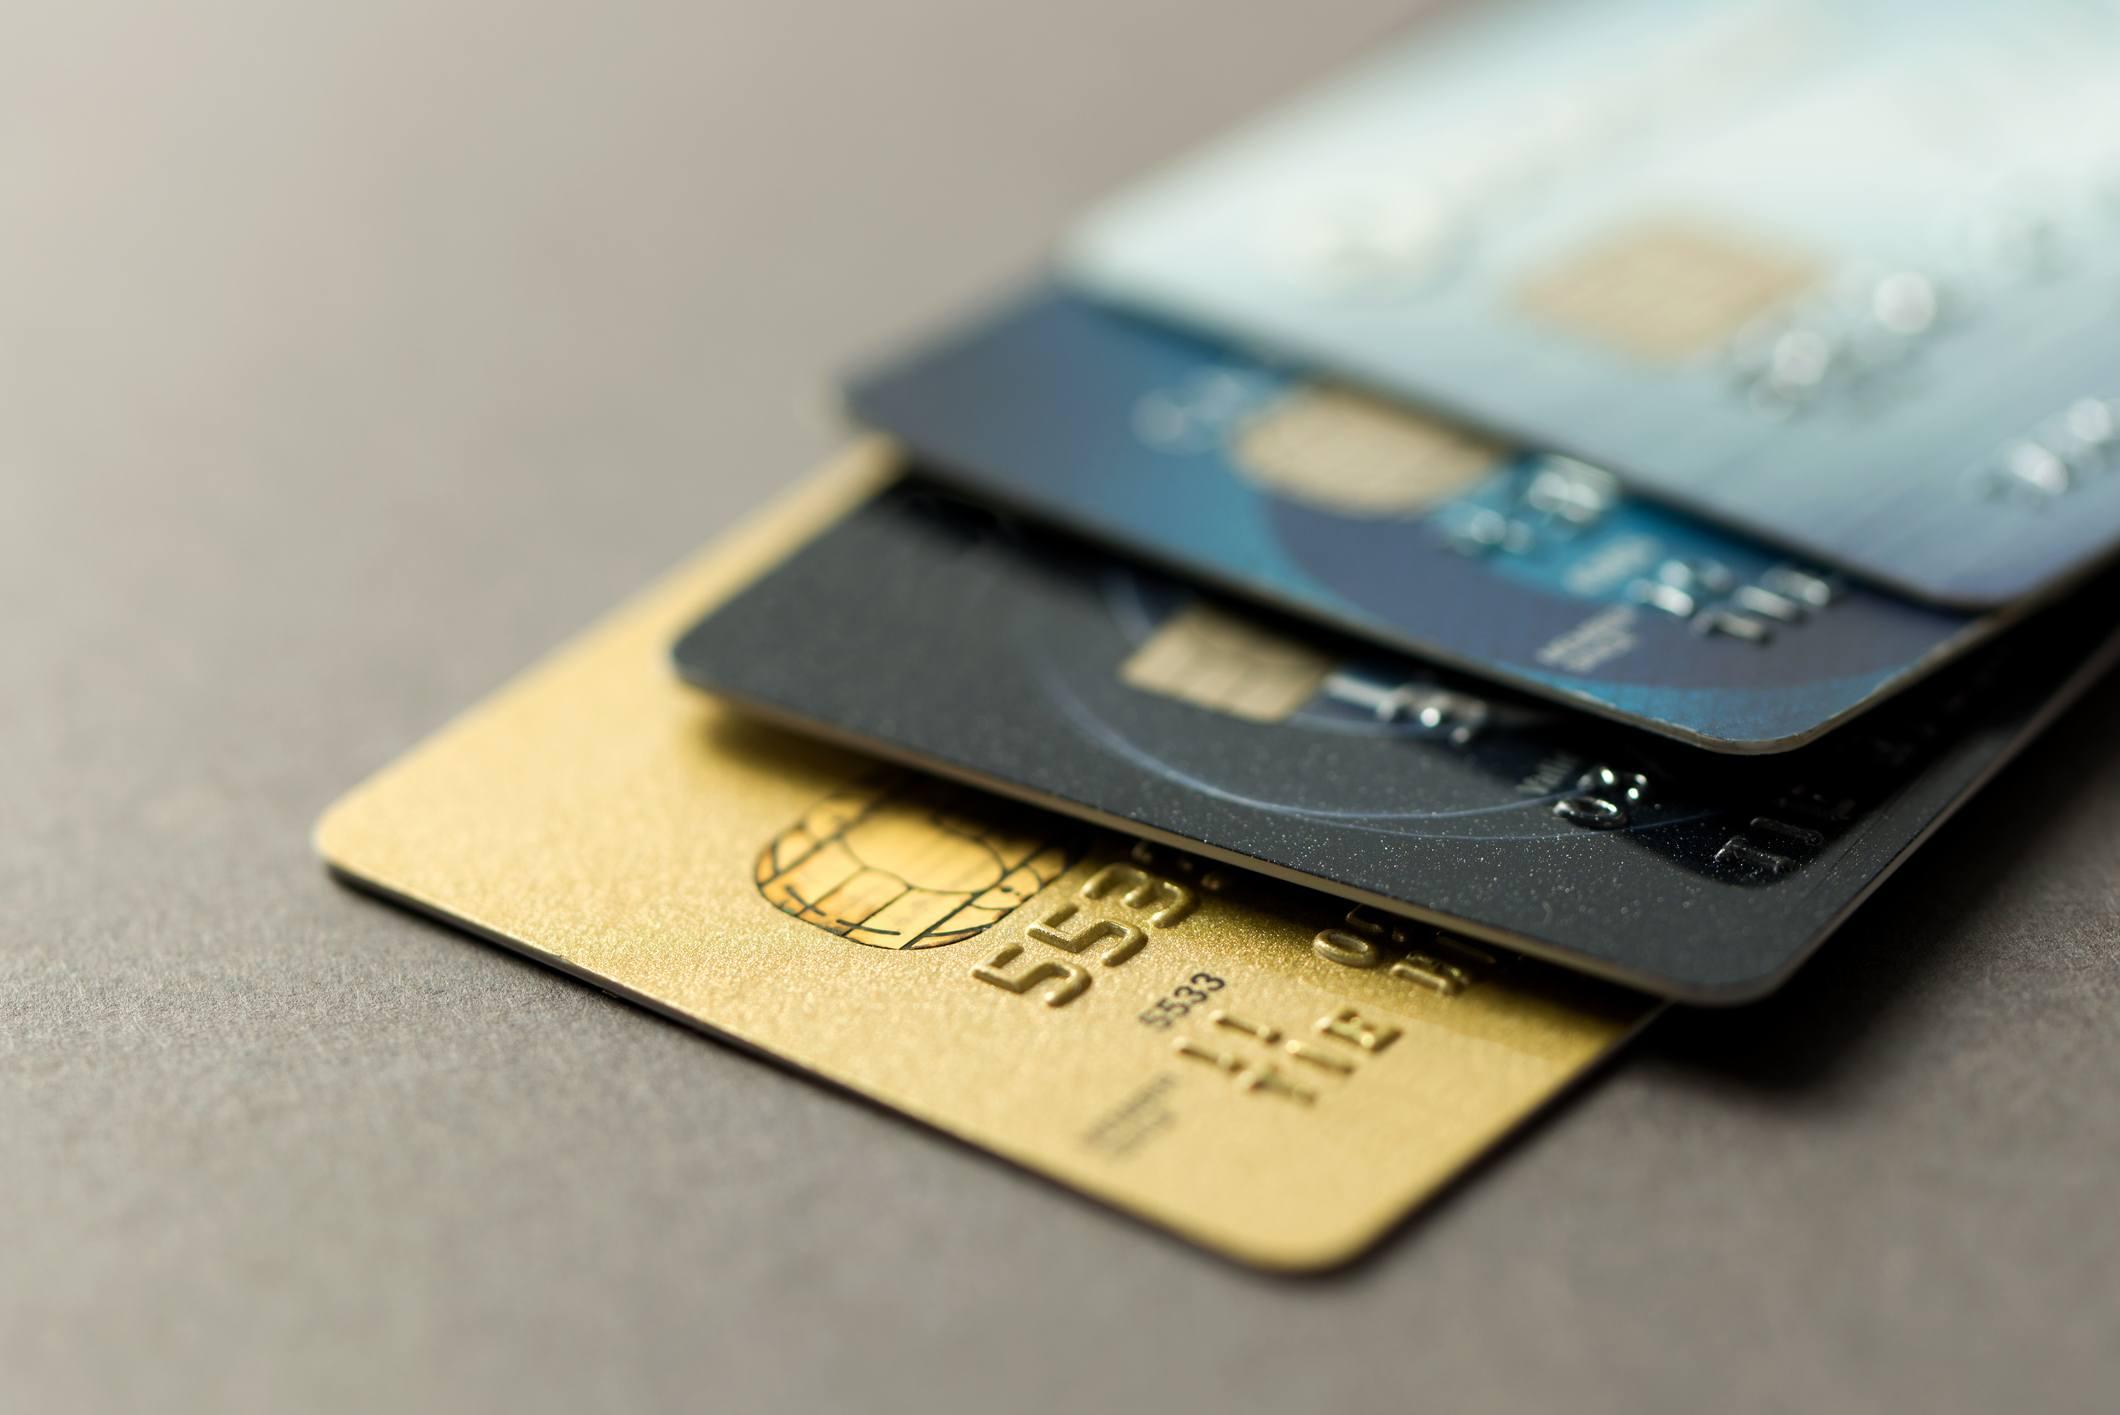 credit cards over grey background